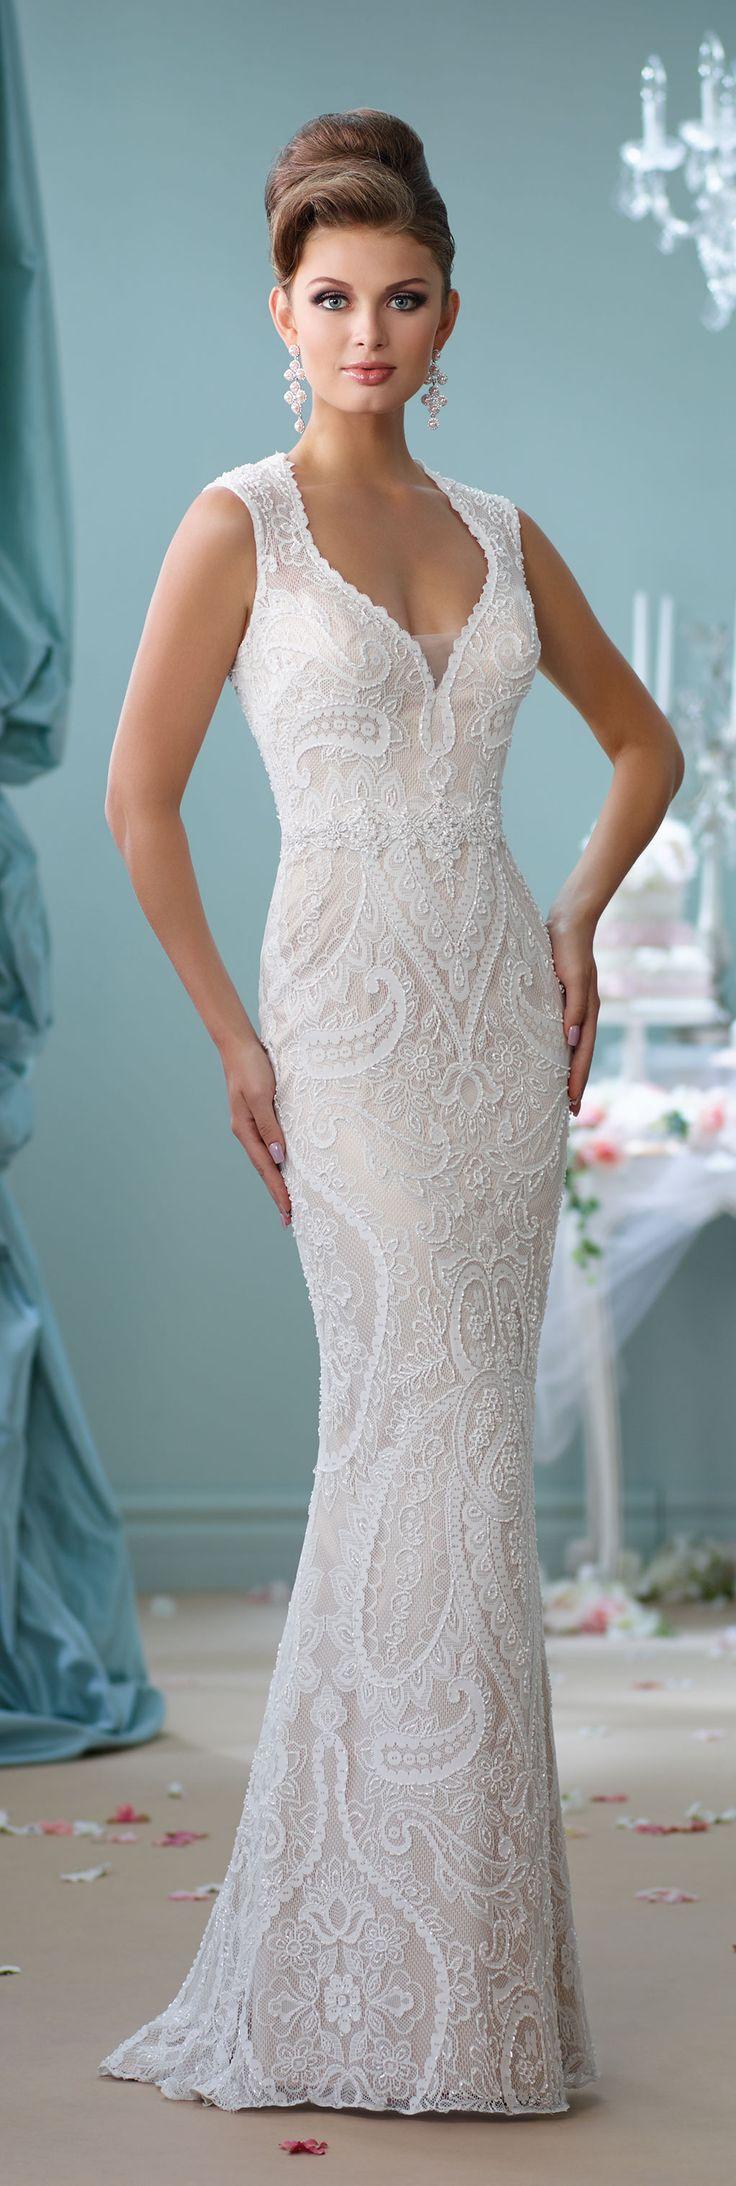 Simple Elegant Wedding Dresses Second Wedding. Awesome Wedding Dress ...